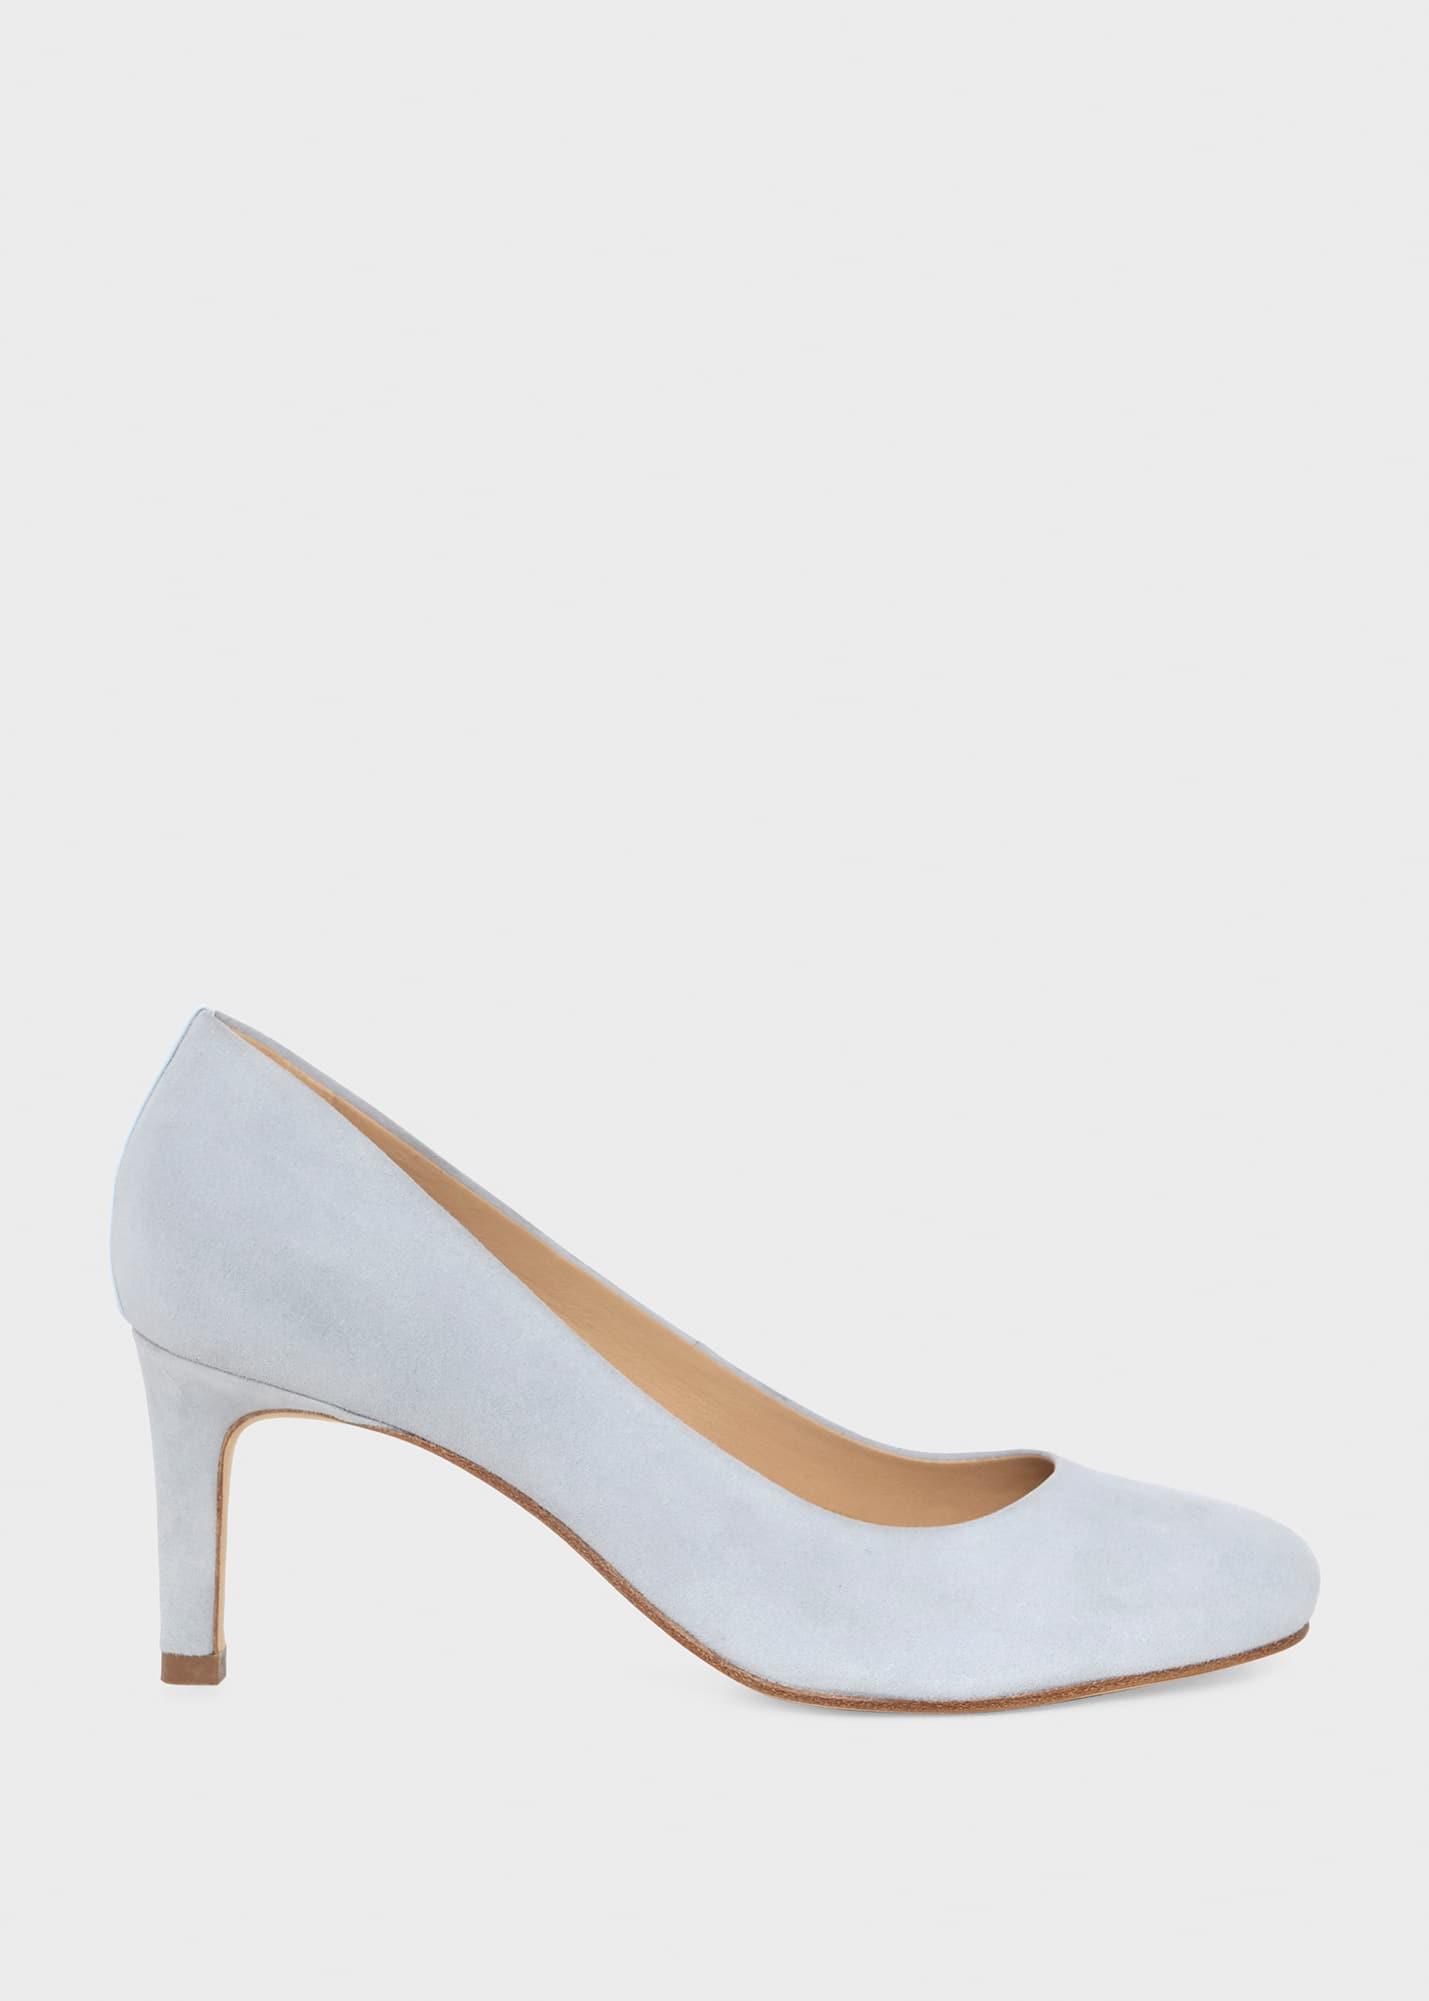 Hobbs Women Lizzie Suede Court Shoes